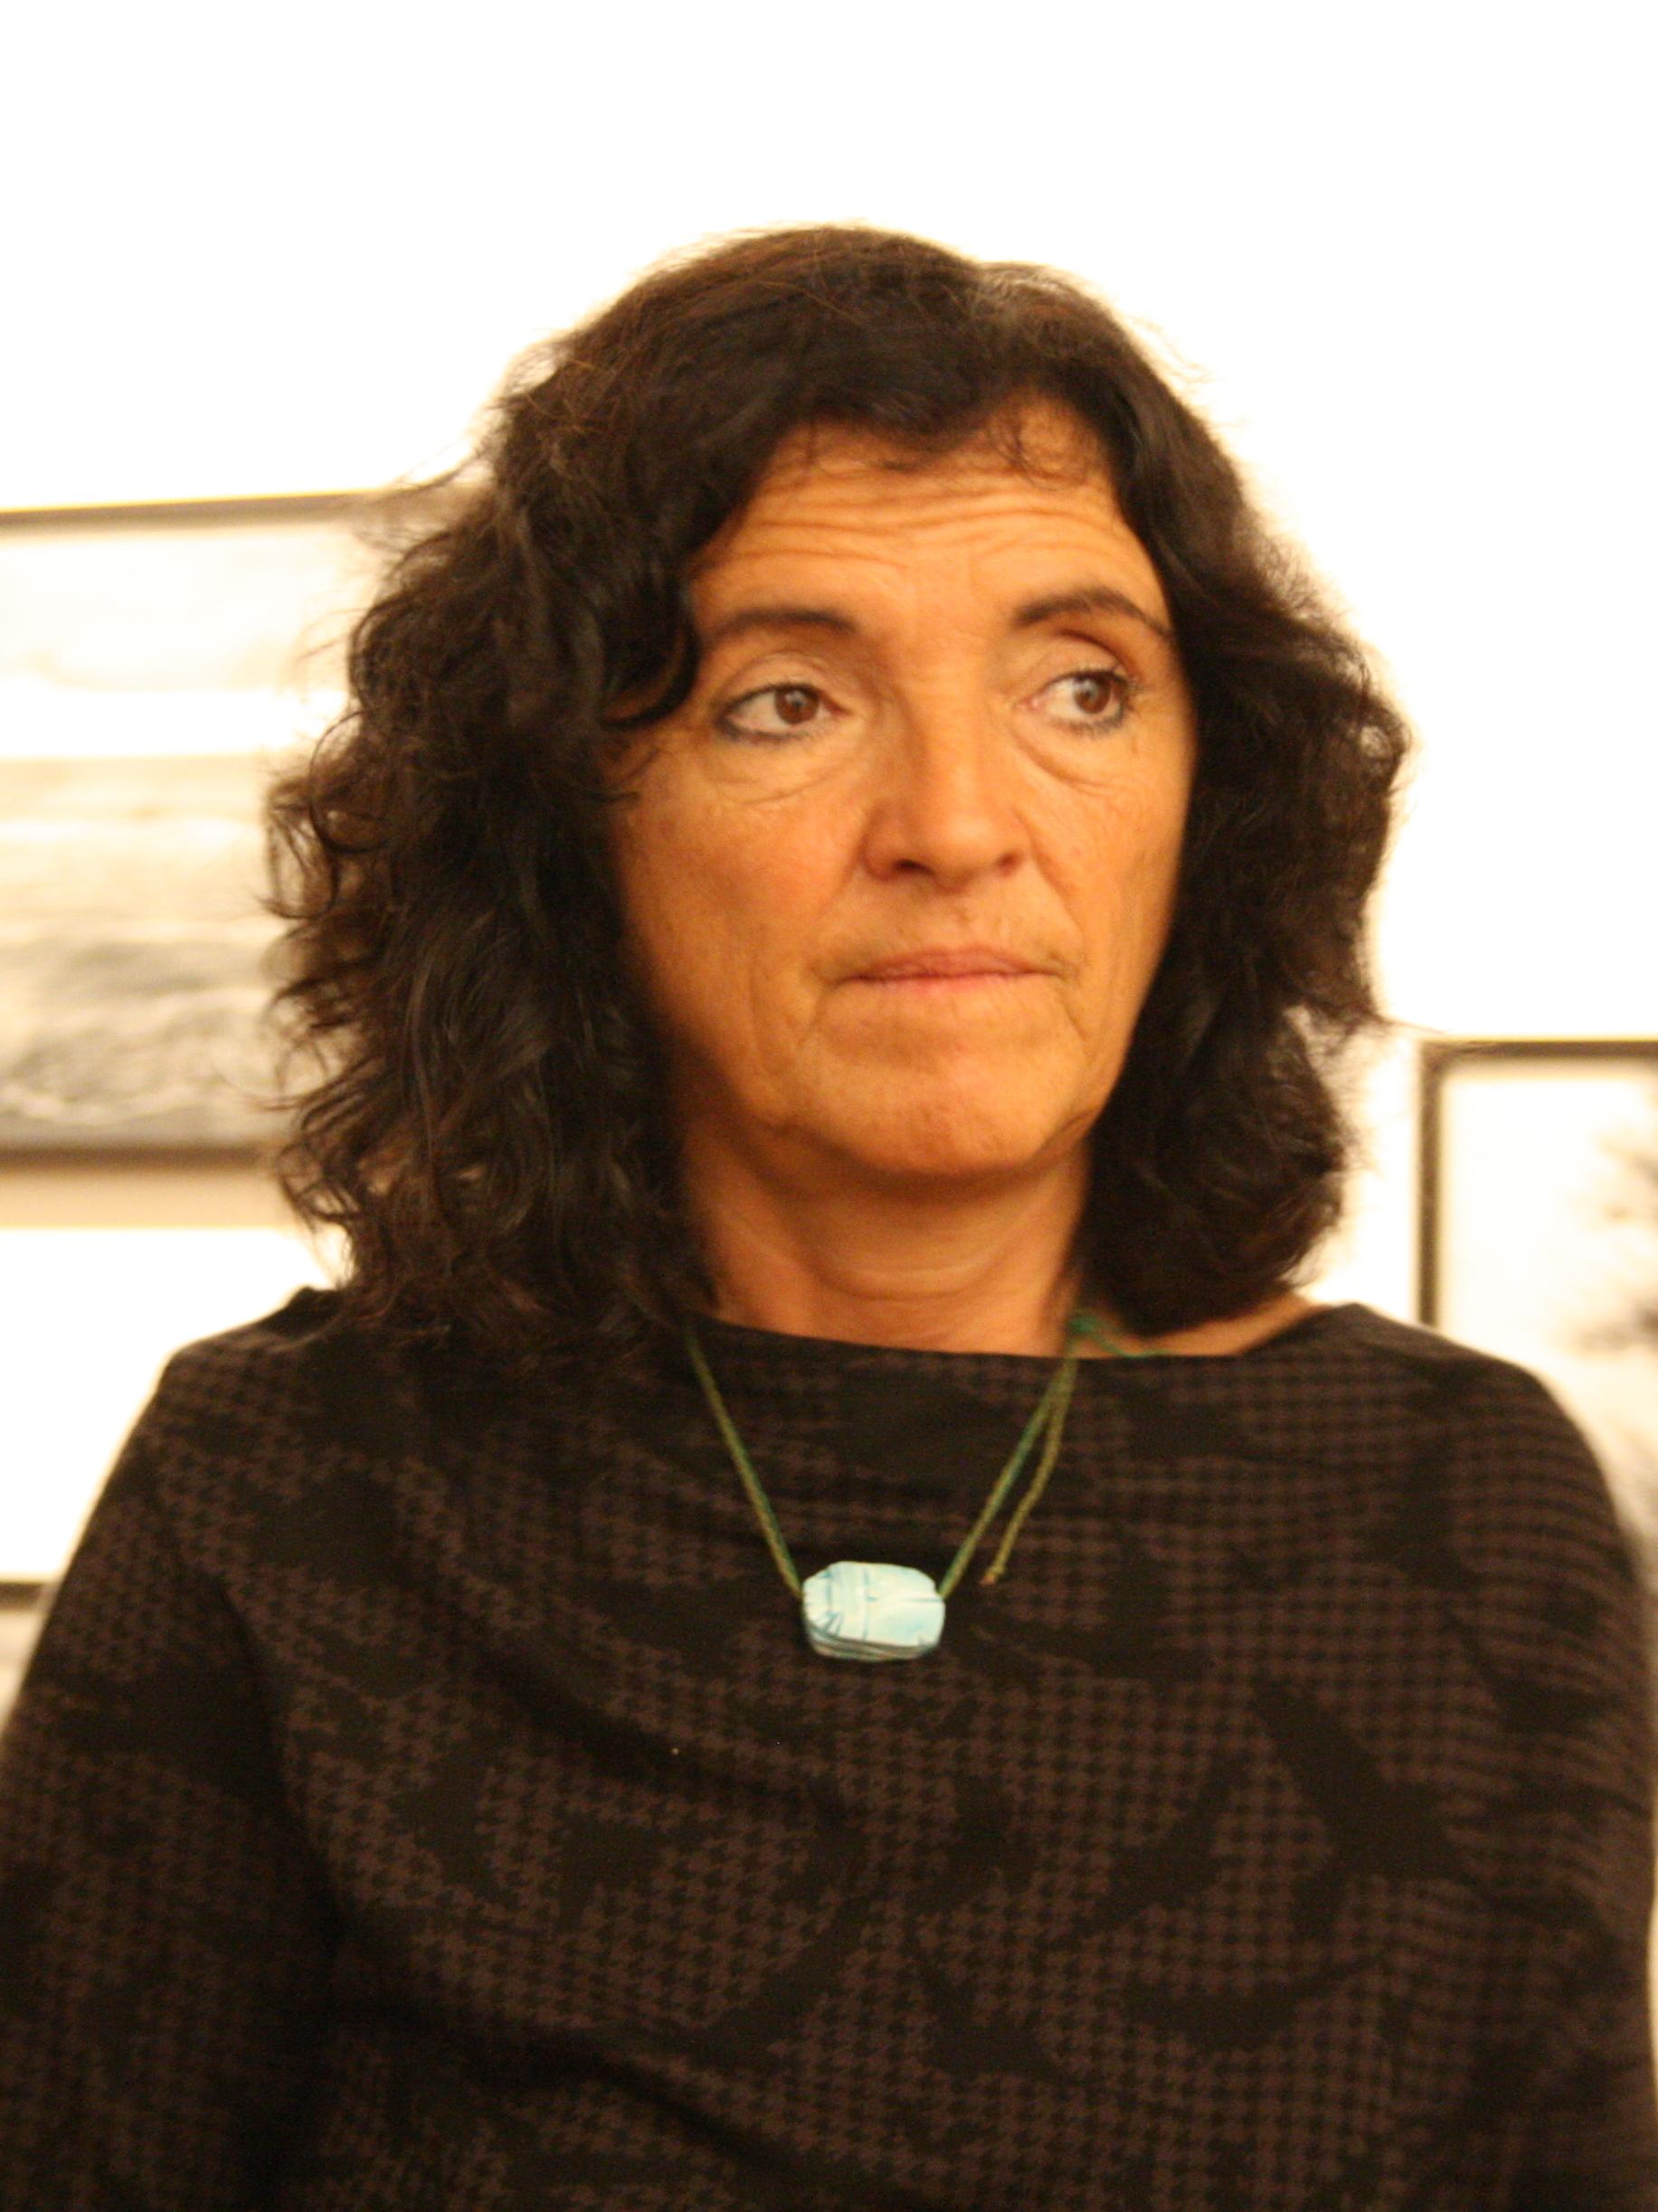 Image of Adriana Lestido from Wikidata